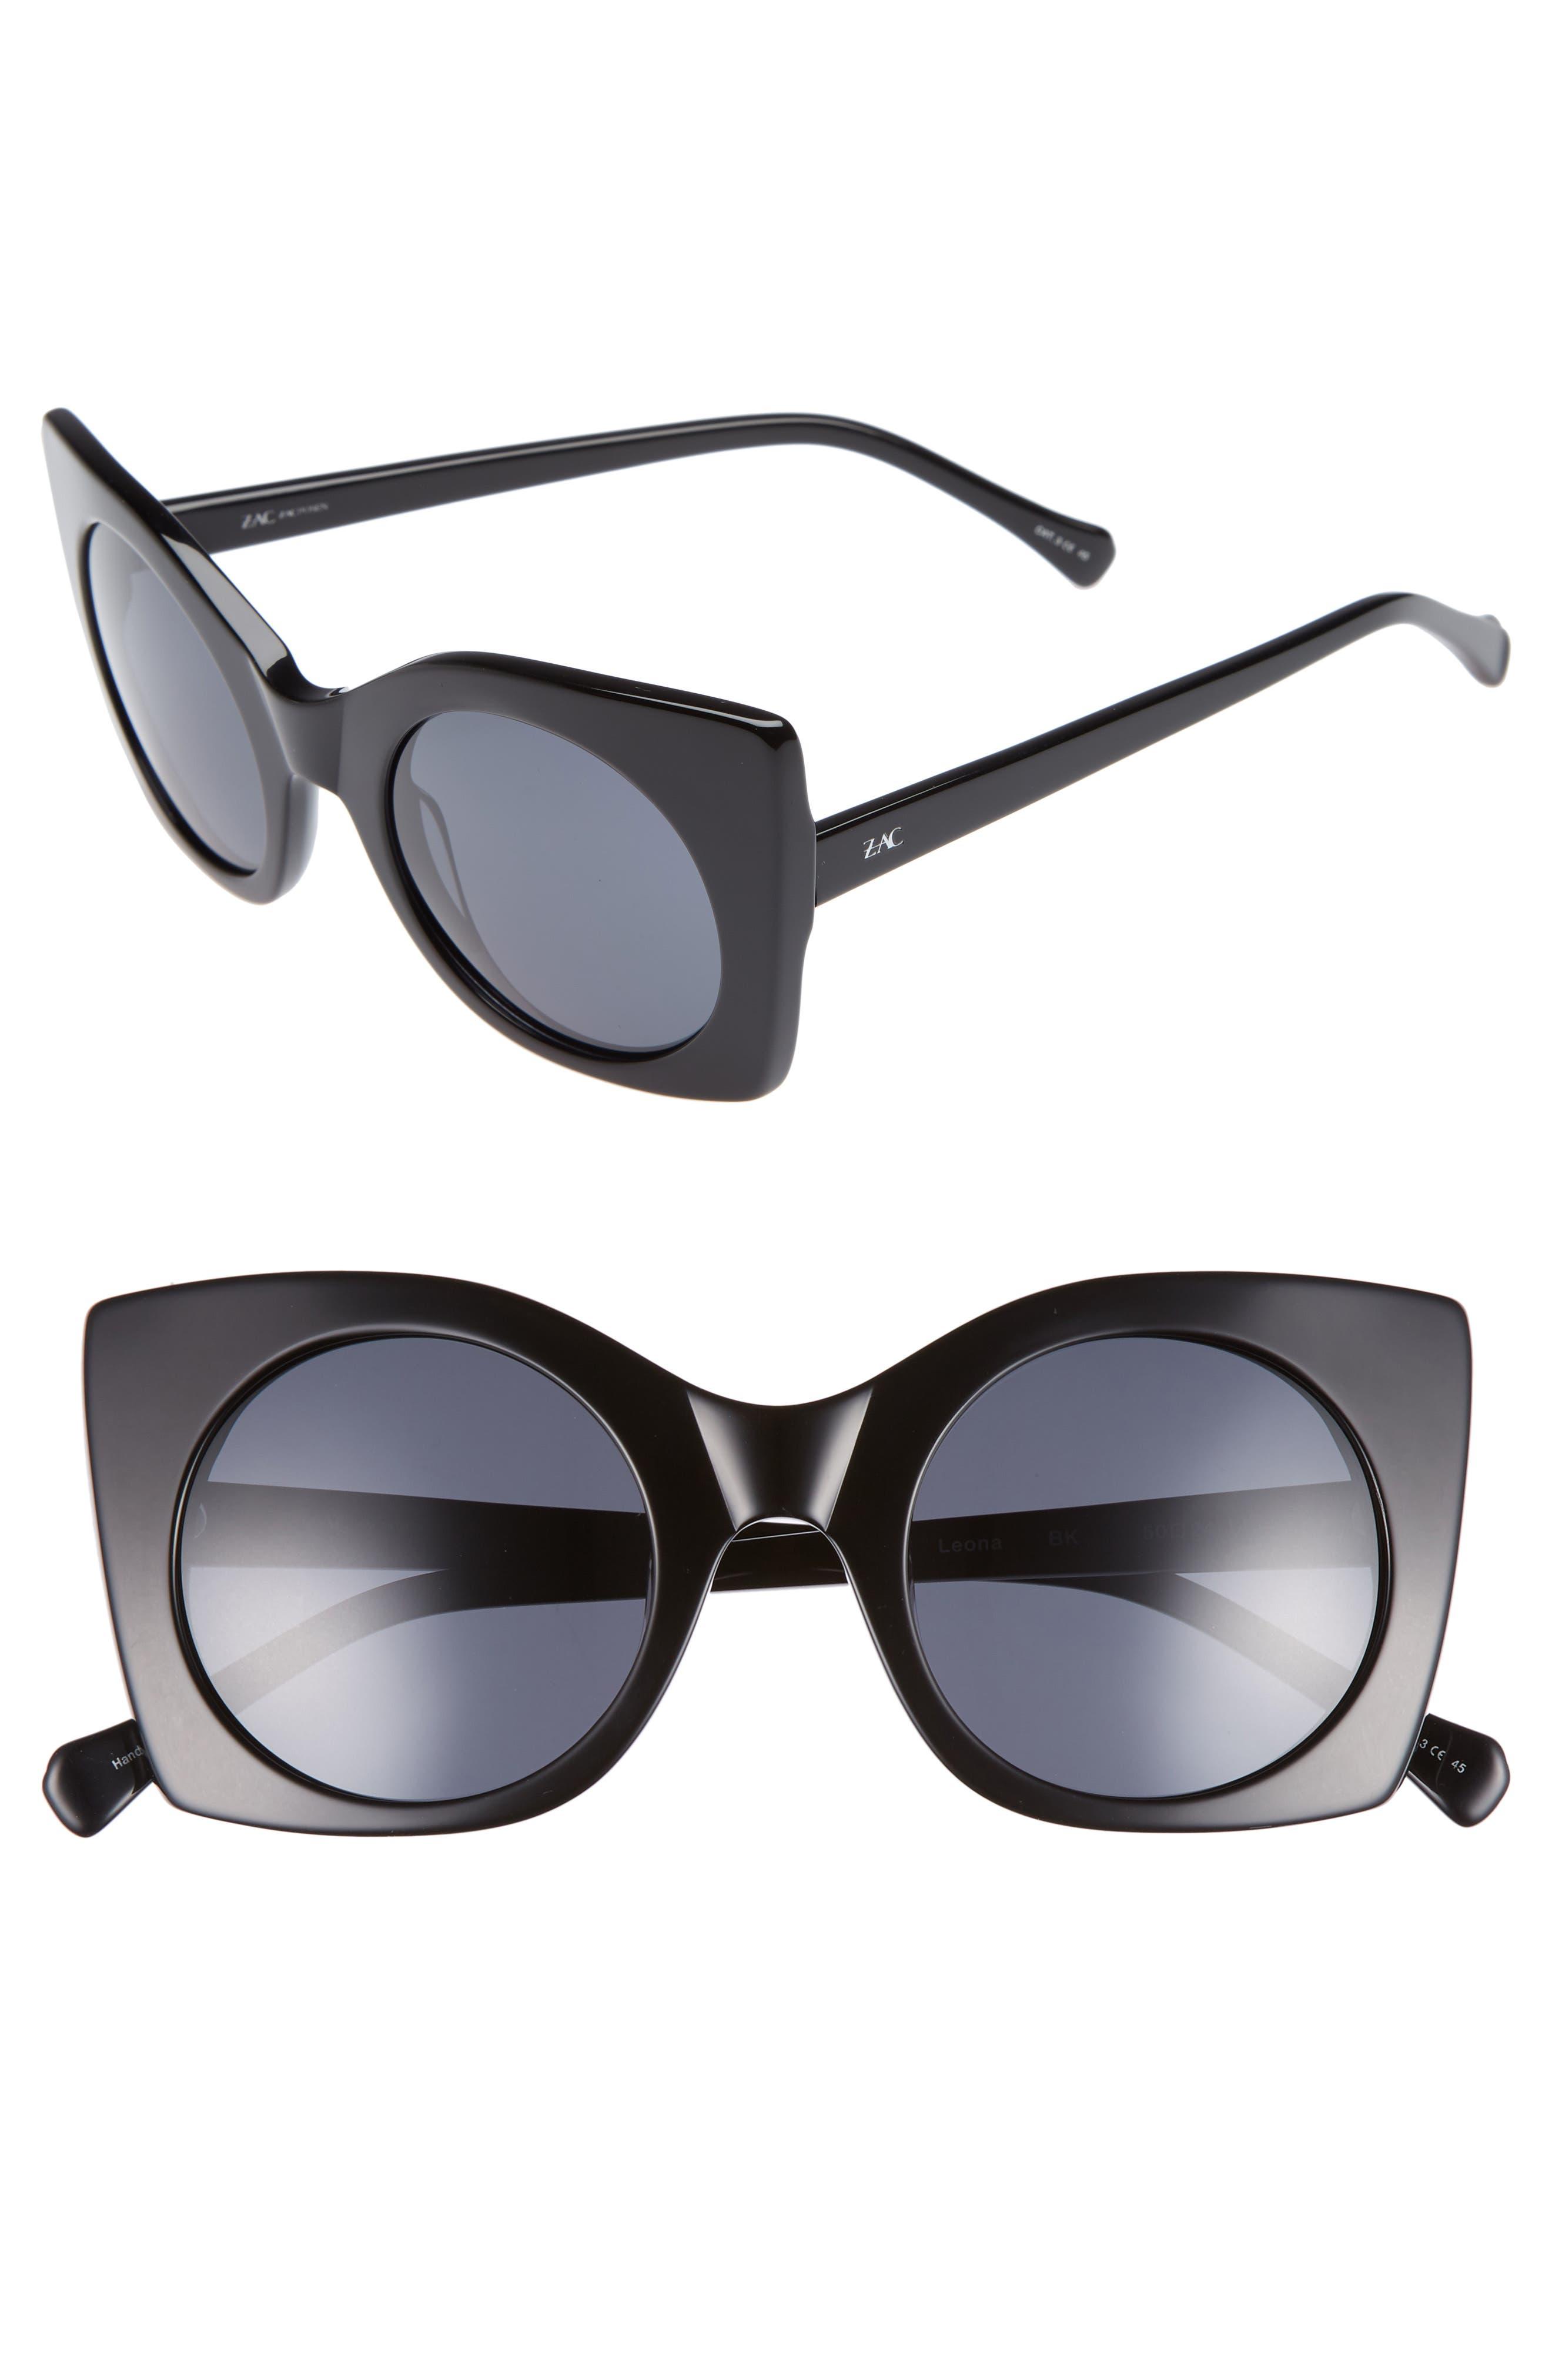 Leona 50mm Polarized Sunglasses,                             Main thumbnail 1, color,                             BLACK POLAR